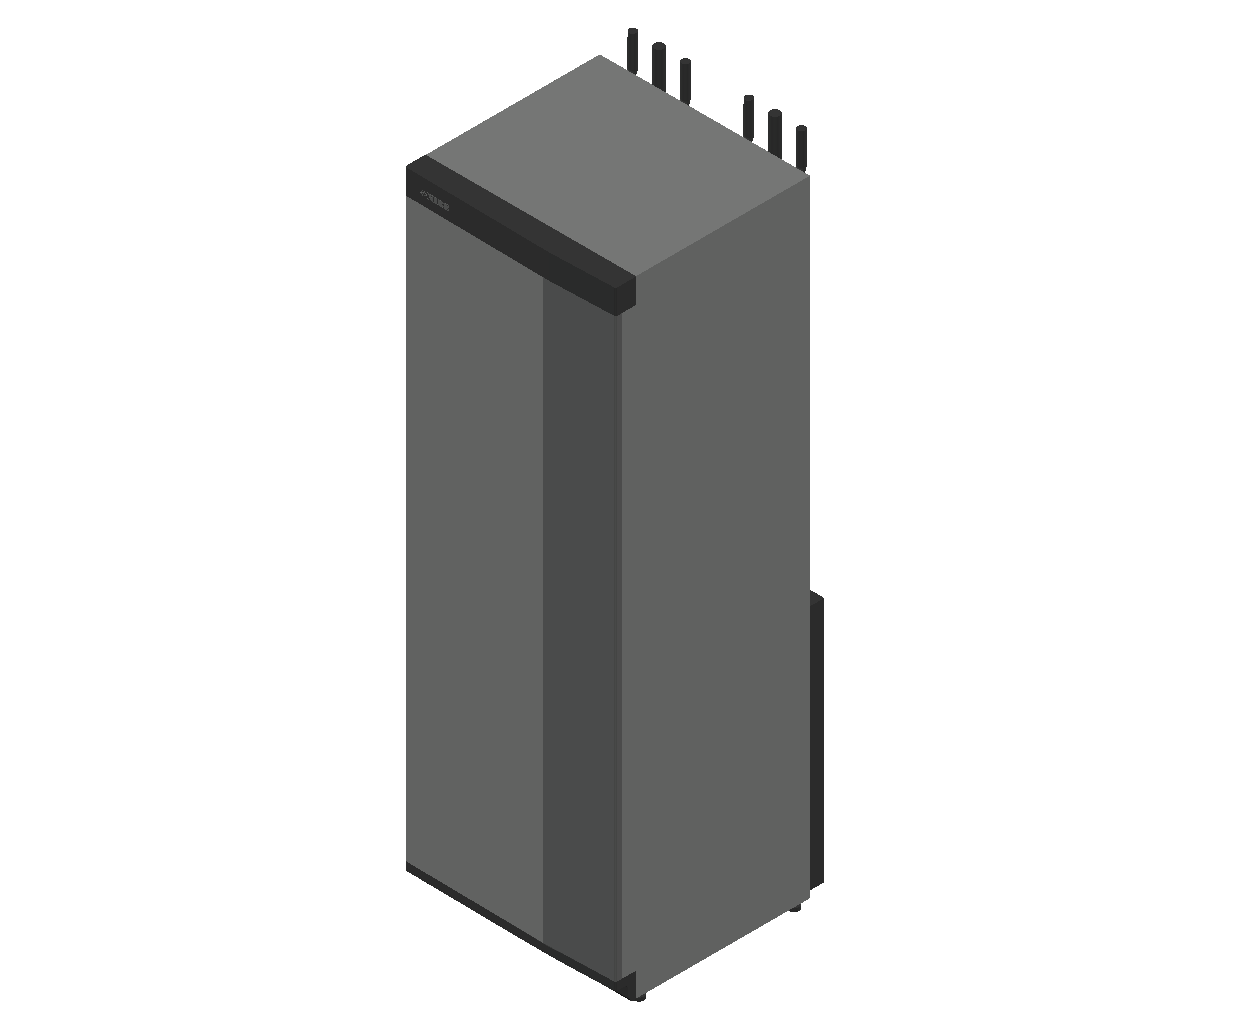 HC_Heat Pump_MEPcontent_NIBE_S1255-6 3x400V_INT-EN.dwg